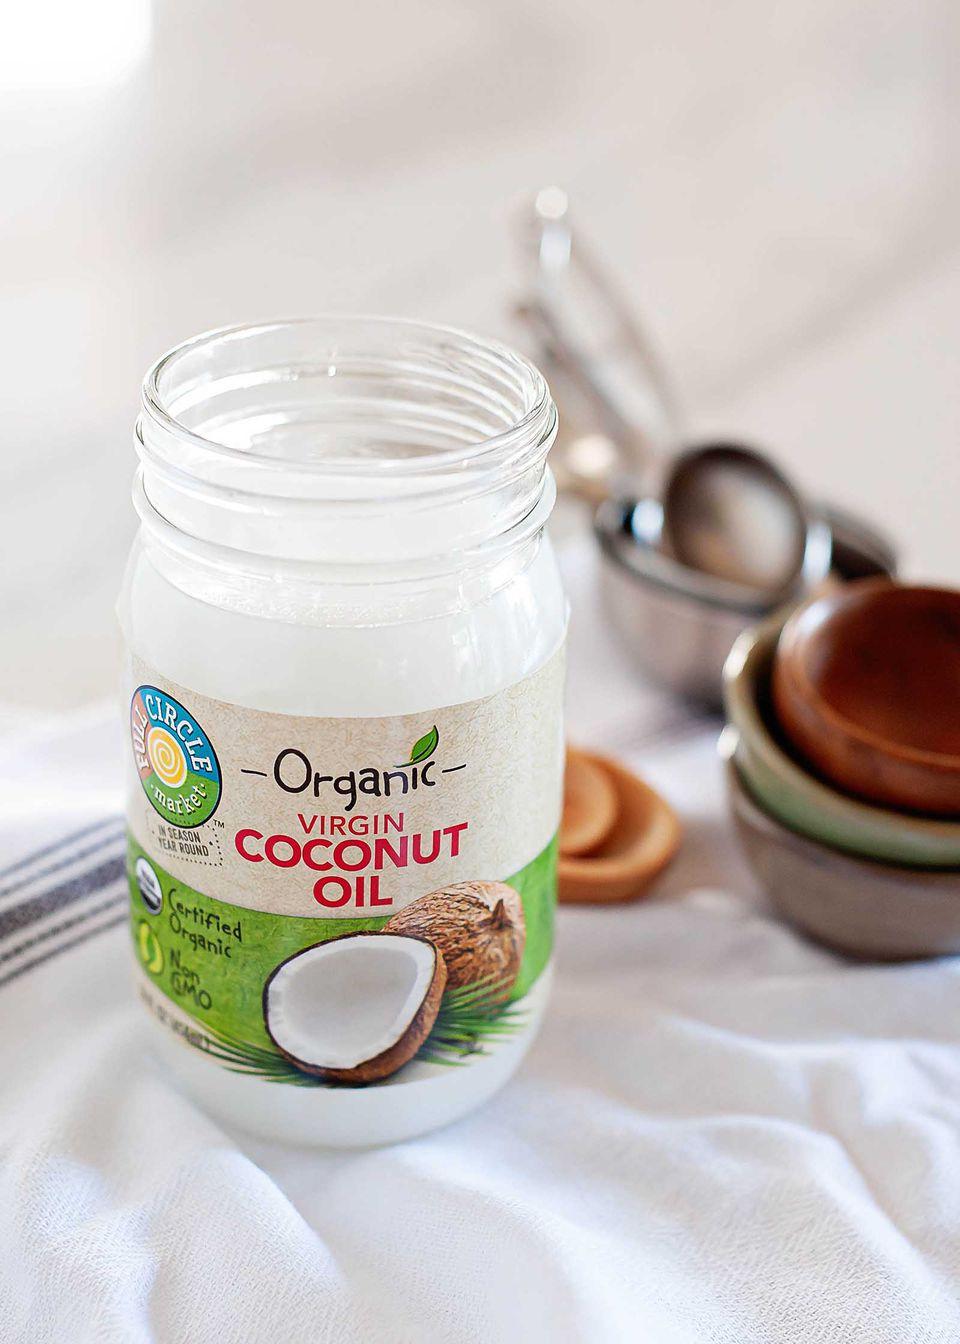 Jar of solid virgin coconut oil